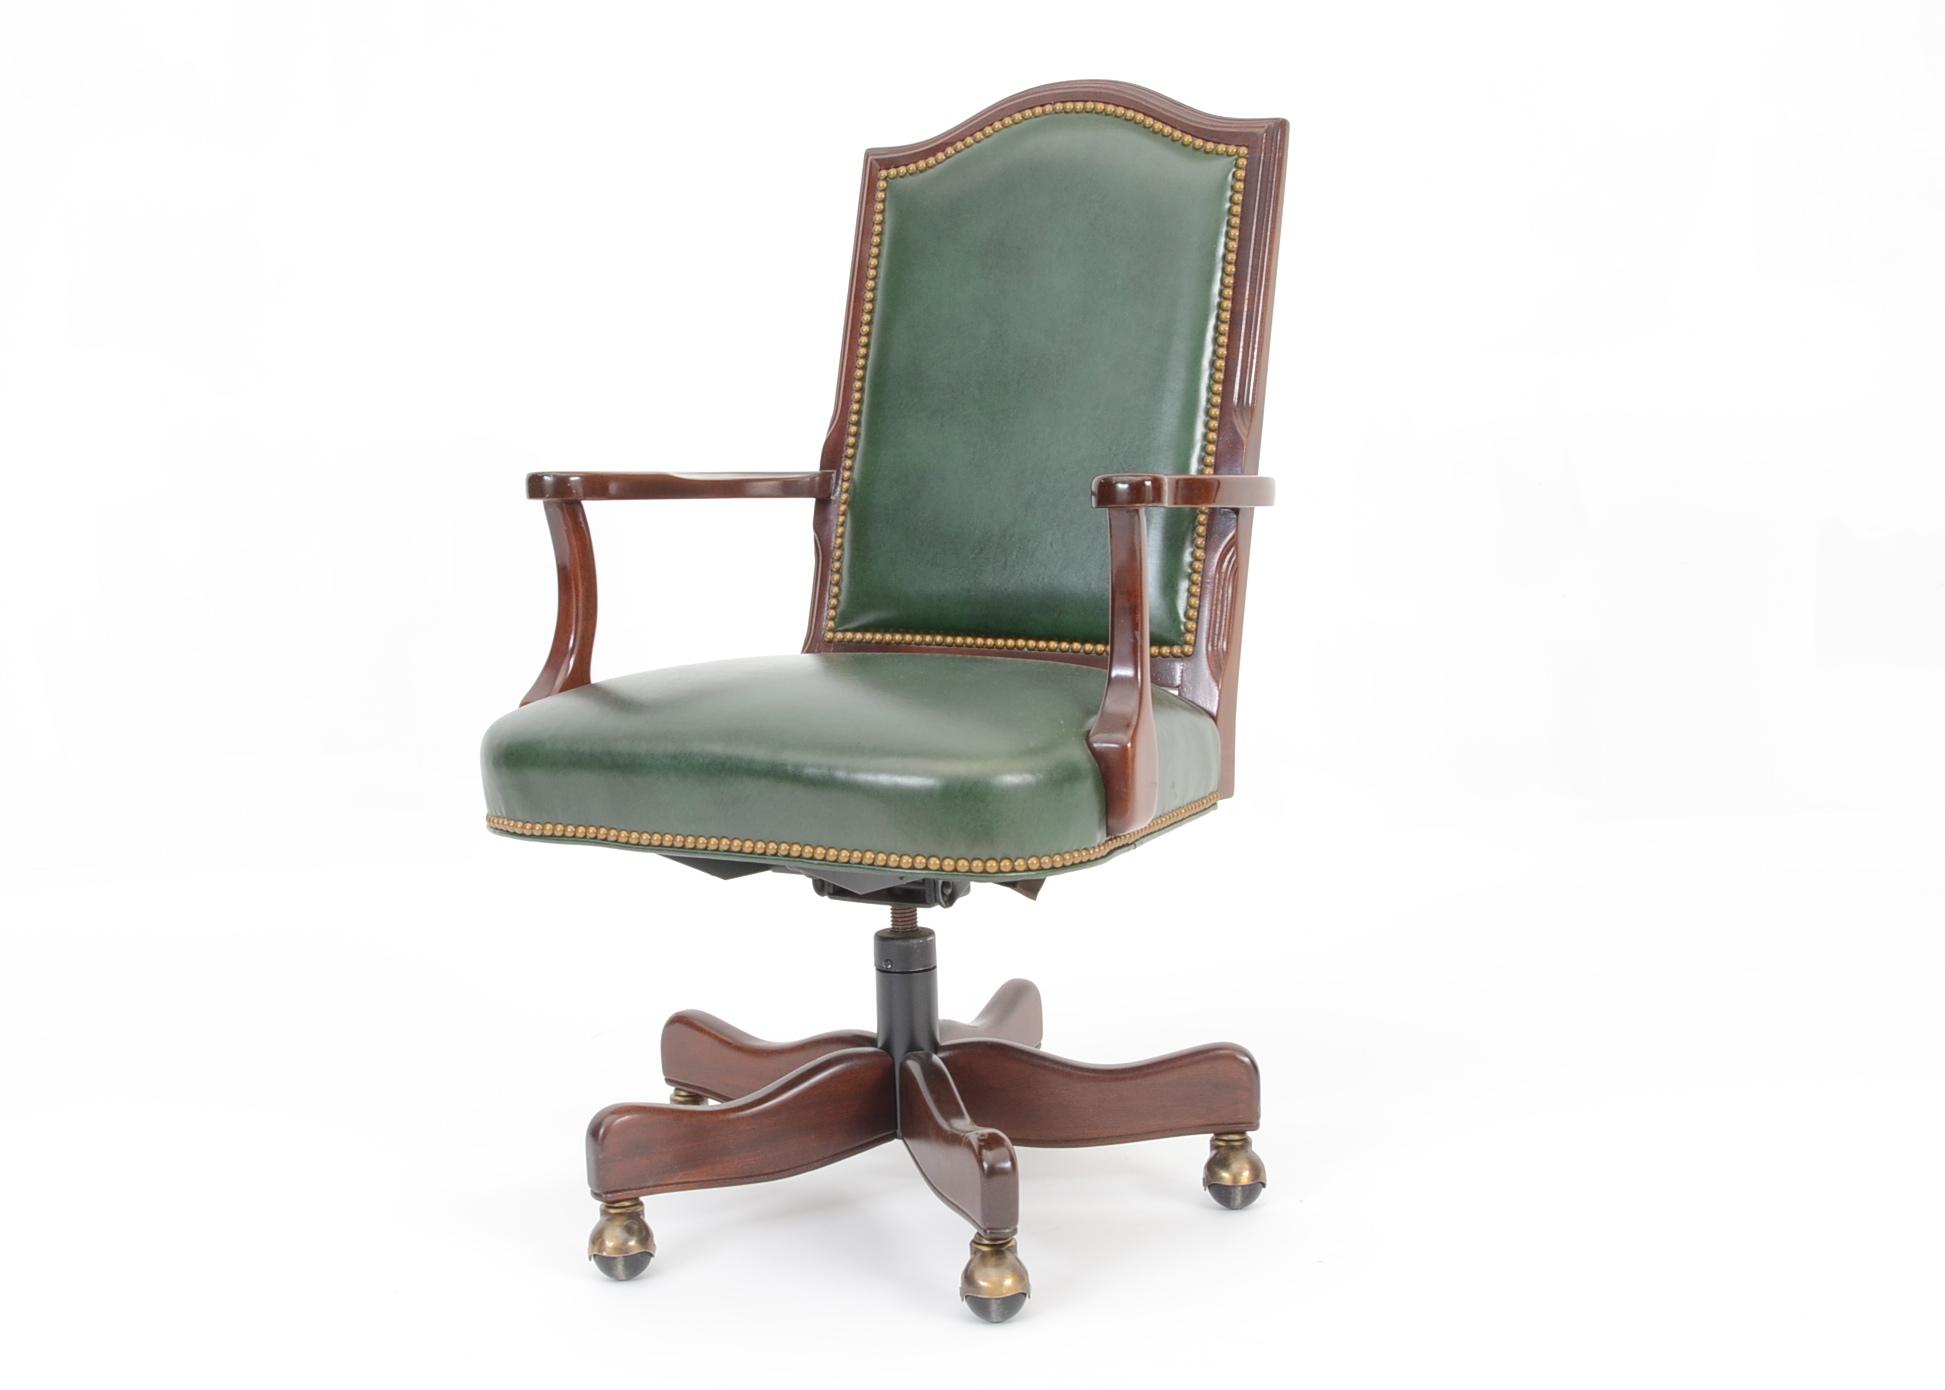 green leather office chair. Hancock \u0026 Moore Green Leather Executive Office Chair E